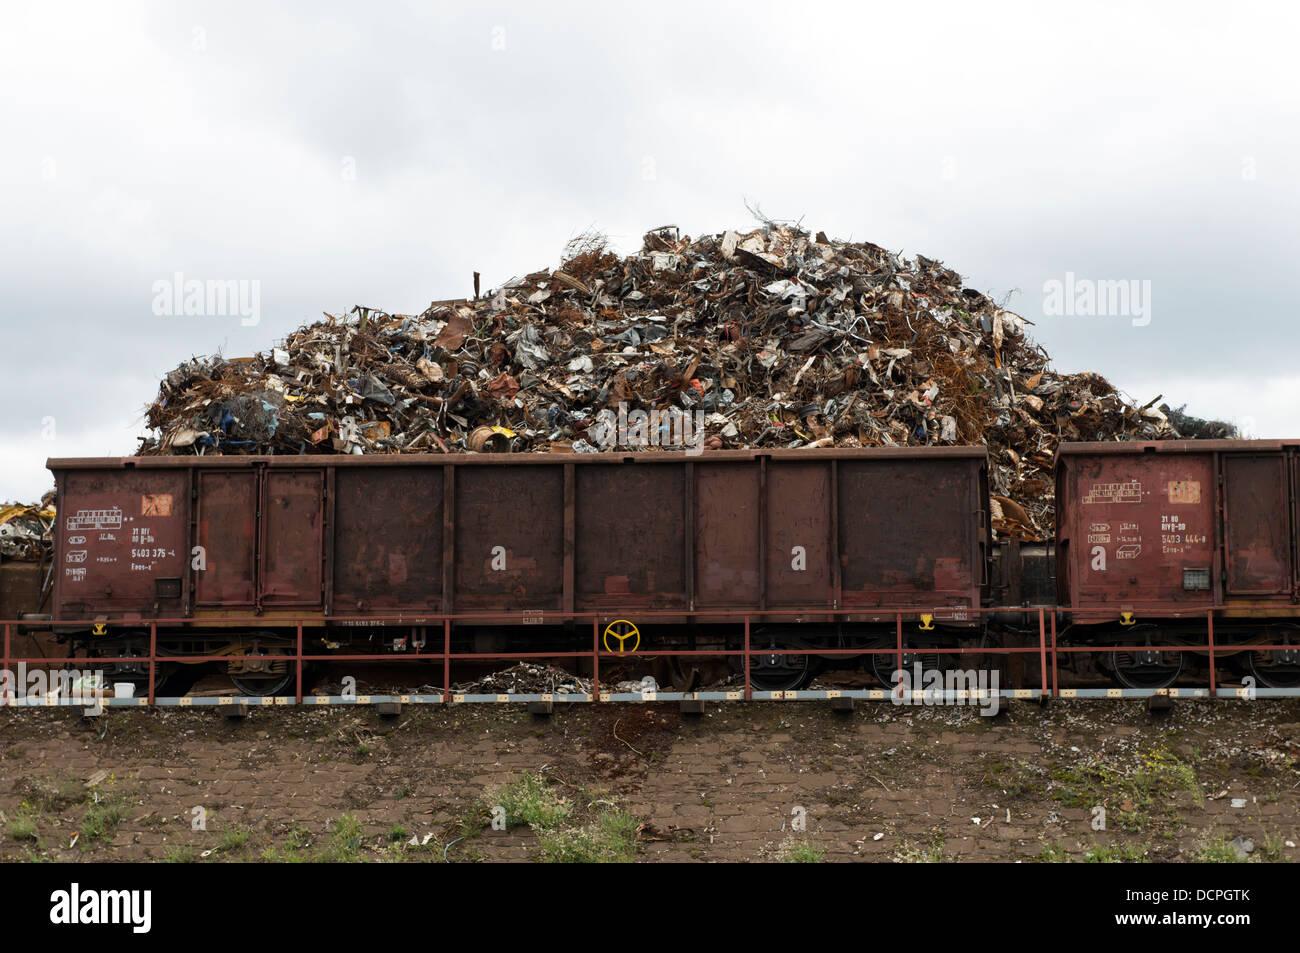 Scrap metal recycling yard Duisburg Germany Stock Photo